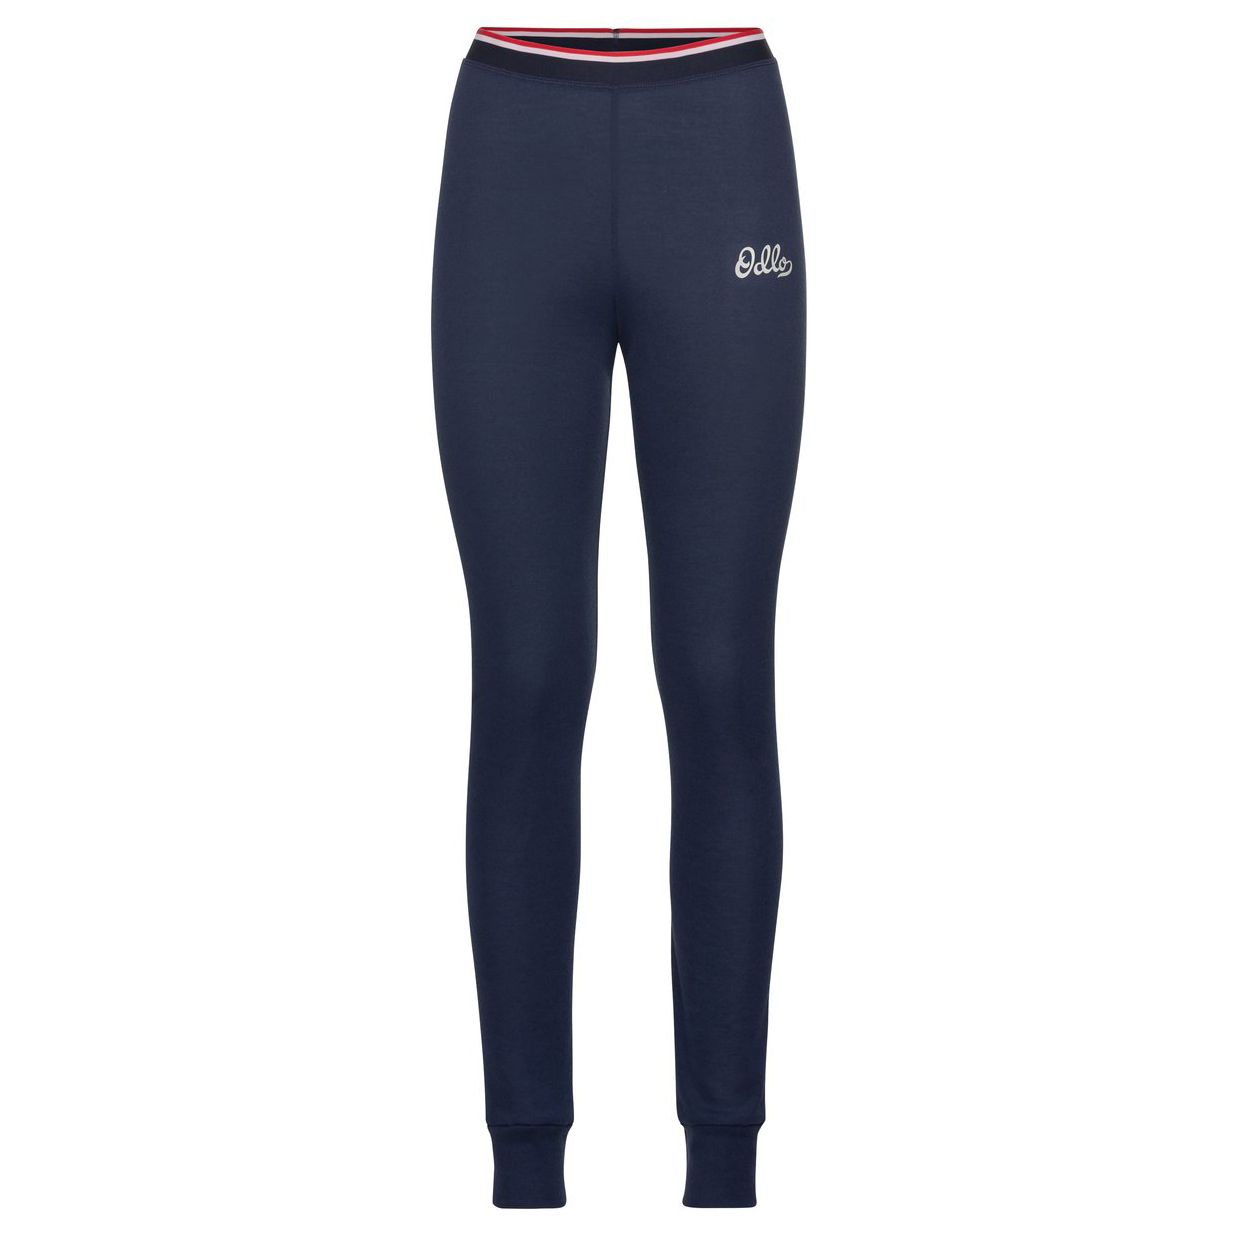 Odlo BL Bottom Long Active Warm Originals Pantalon Femme